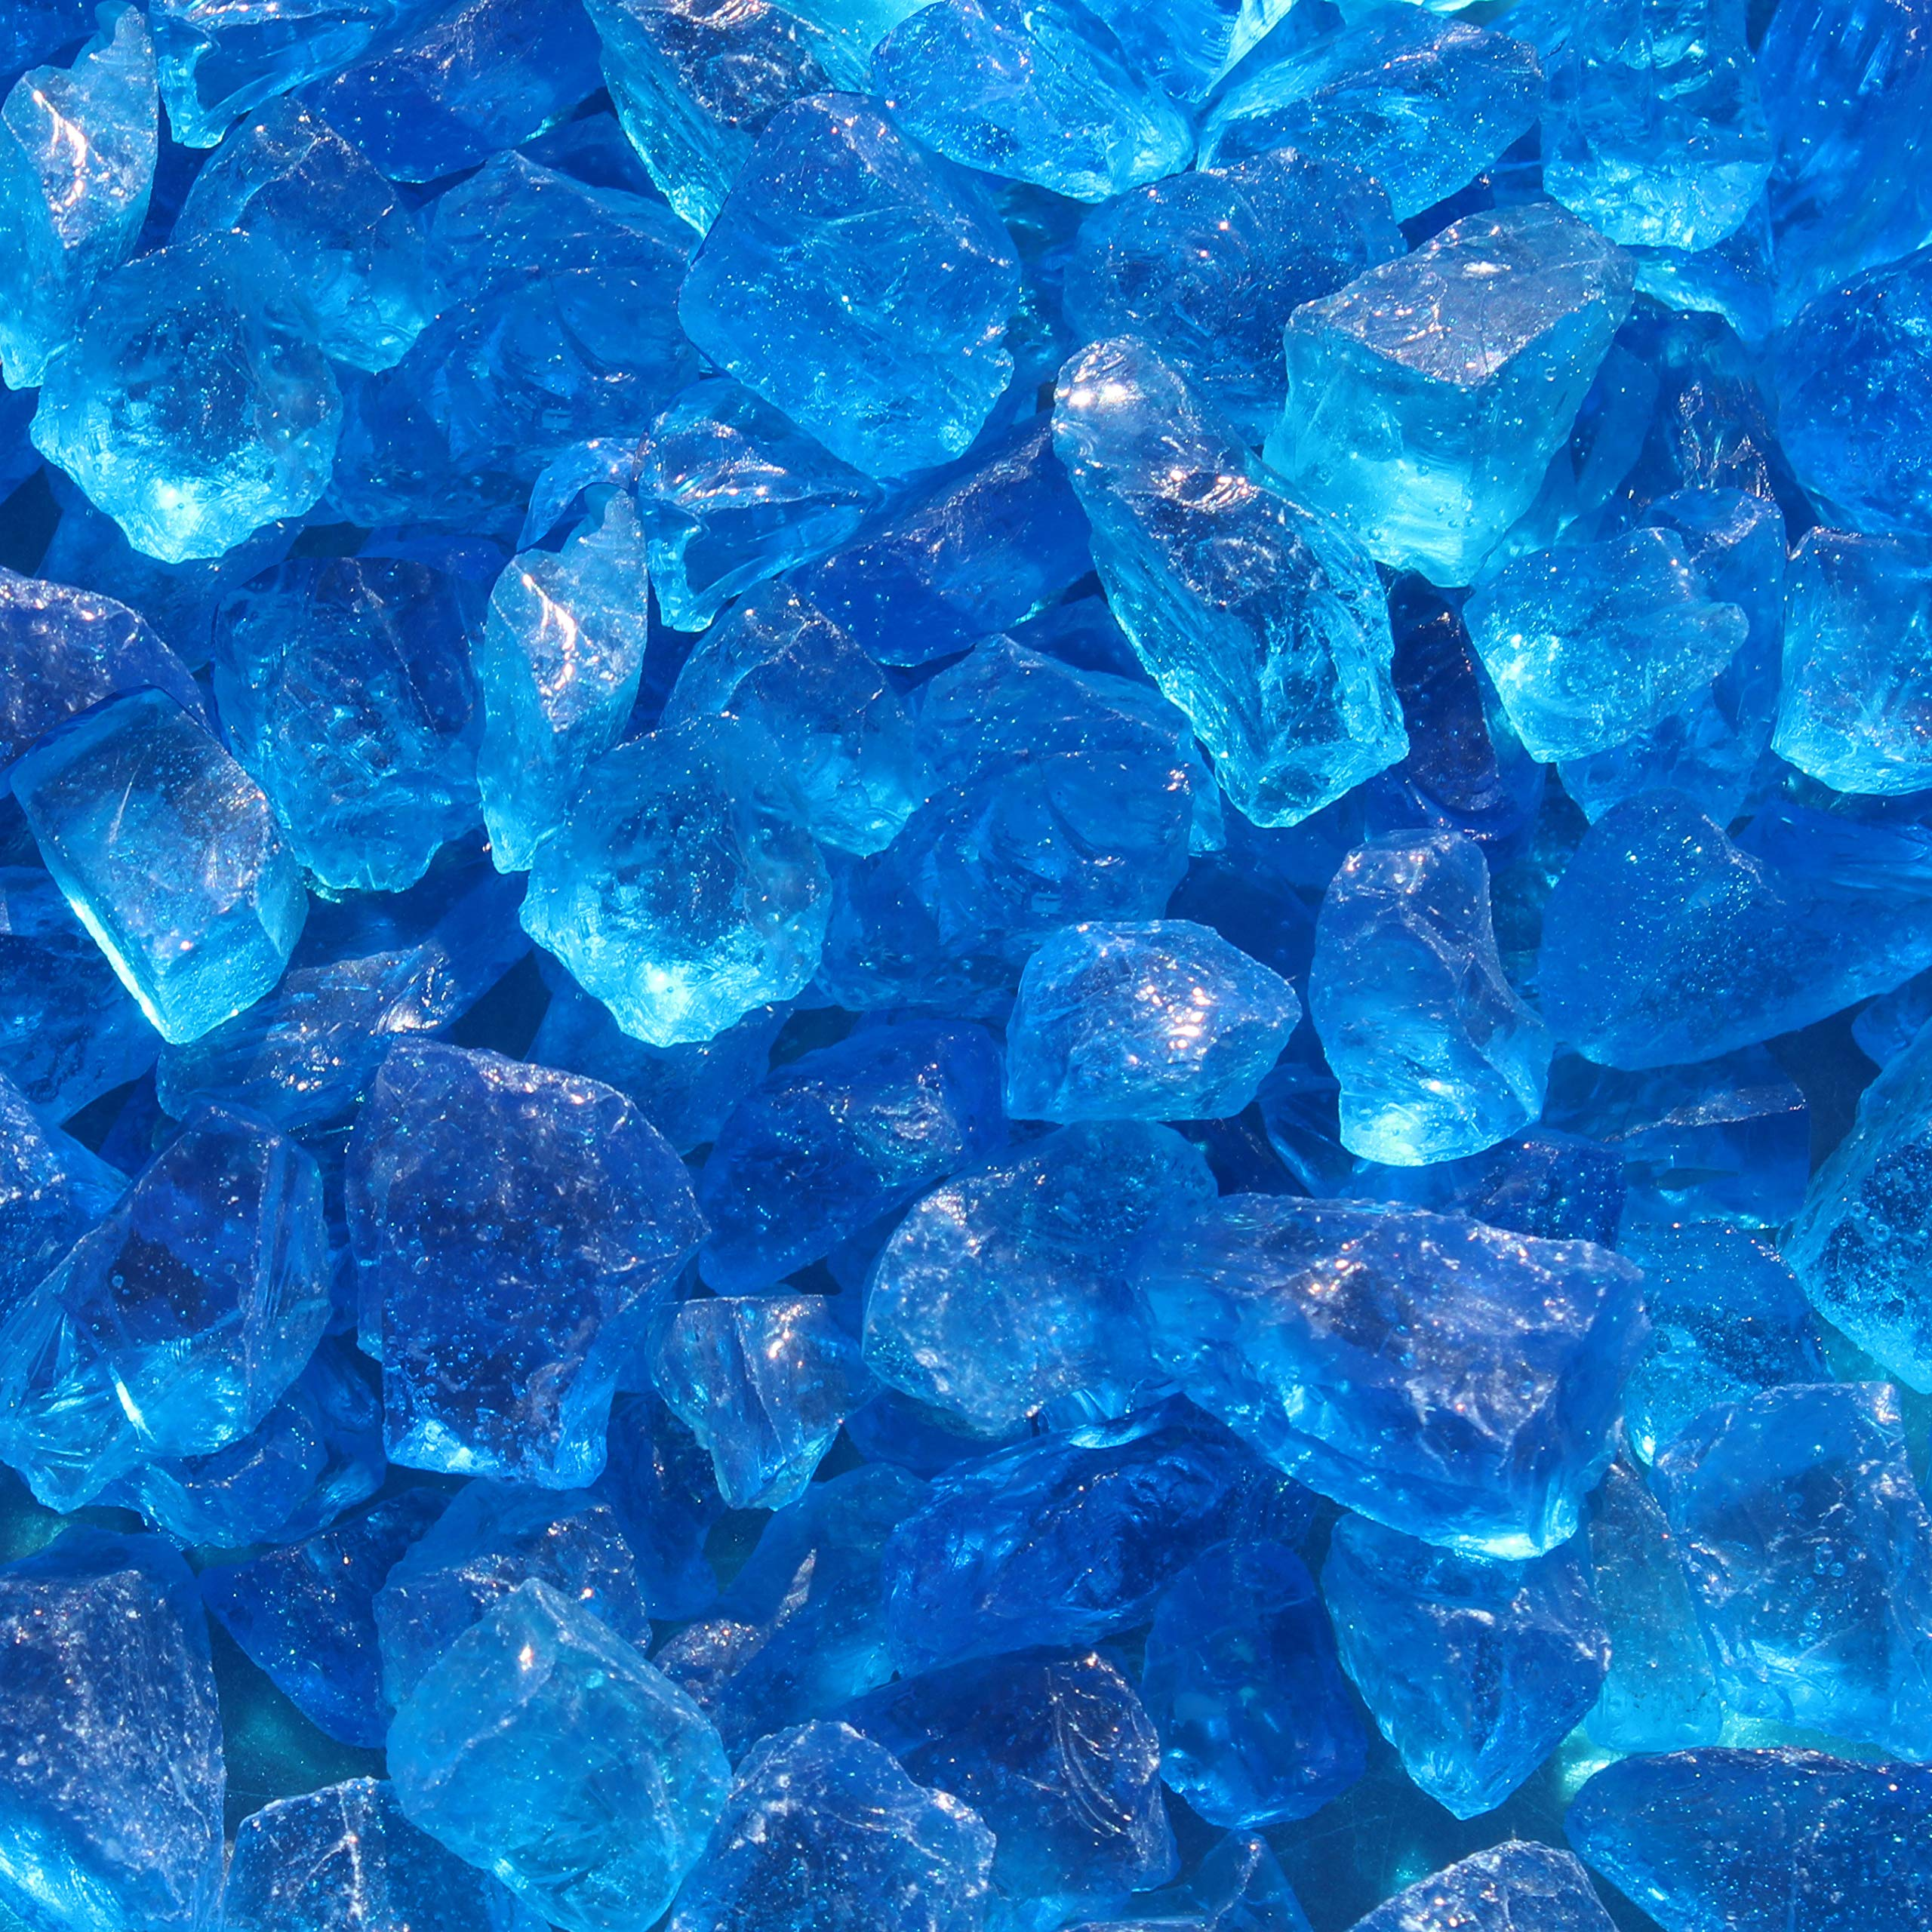 Blue Ridge Brand&Trade; Light Blue Fire Glass - 50-Pound Professional Grade Fire Pit Glass - 1/2'' Fire Glass Bulk Pack - Glass Rock Contractor Pack by Blue Ridge Brand